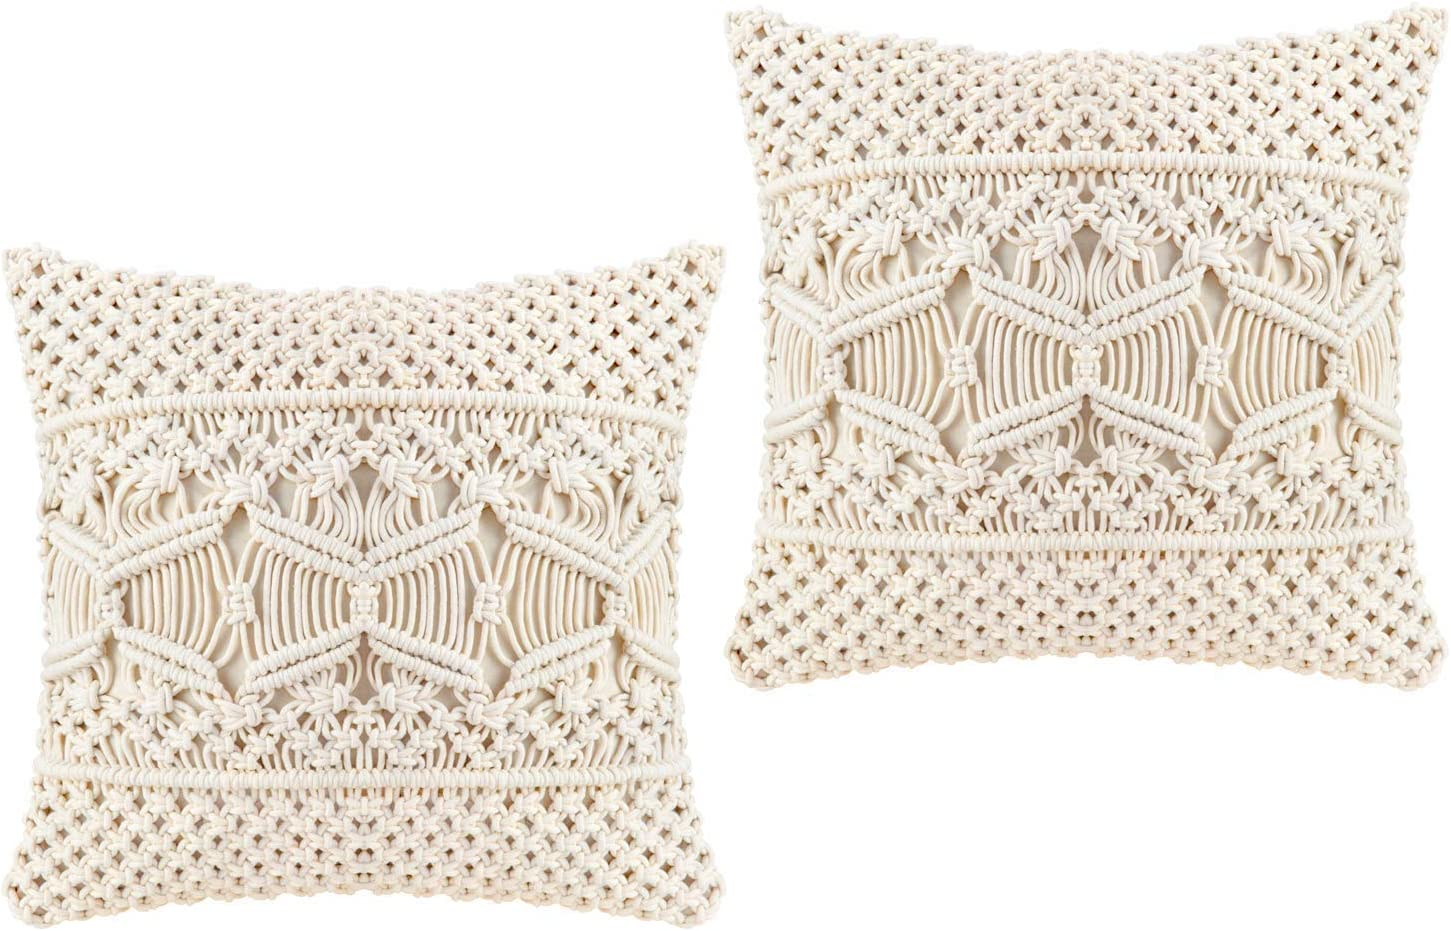 Mkouo Funda de Almohada Macramé Funda de cojín (Insertos de Almohada no incluidos) Set of 2 Funda de Almohada Decorativa for Bed Sofa Couch Bench Car Boho Home Decor,43cm